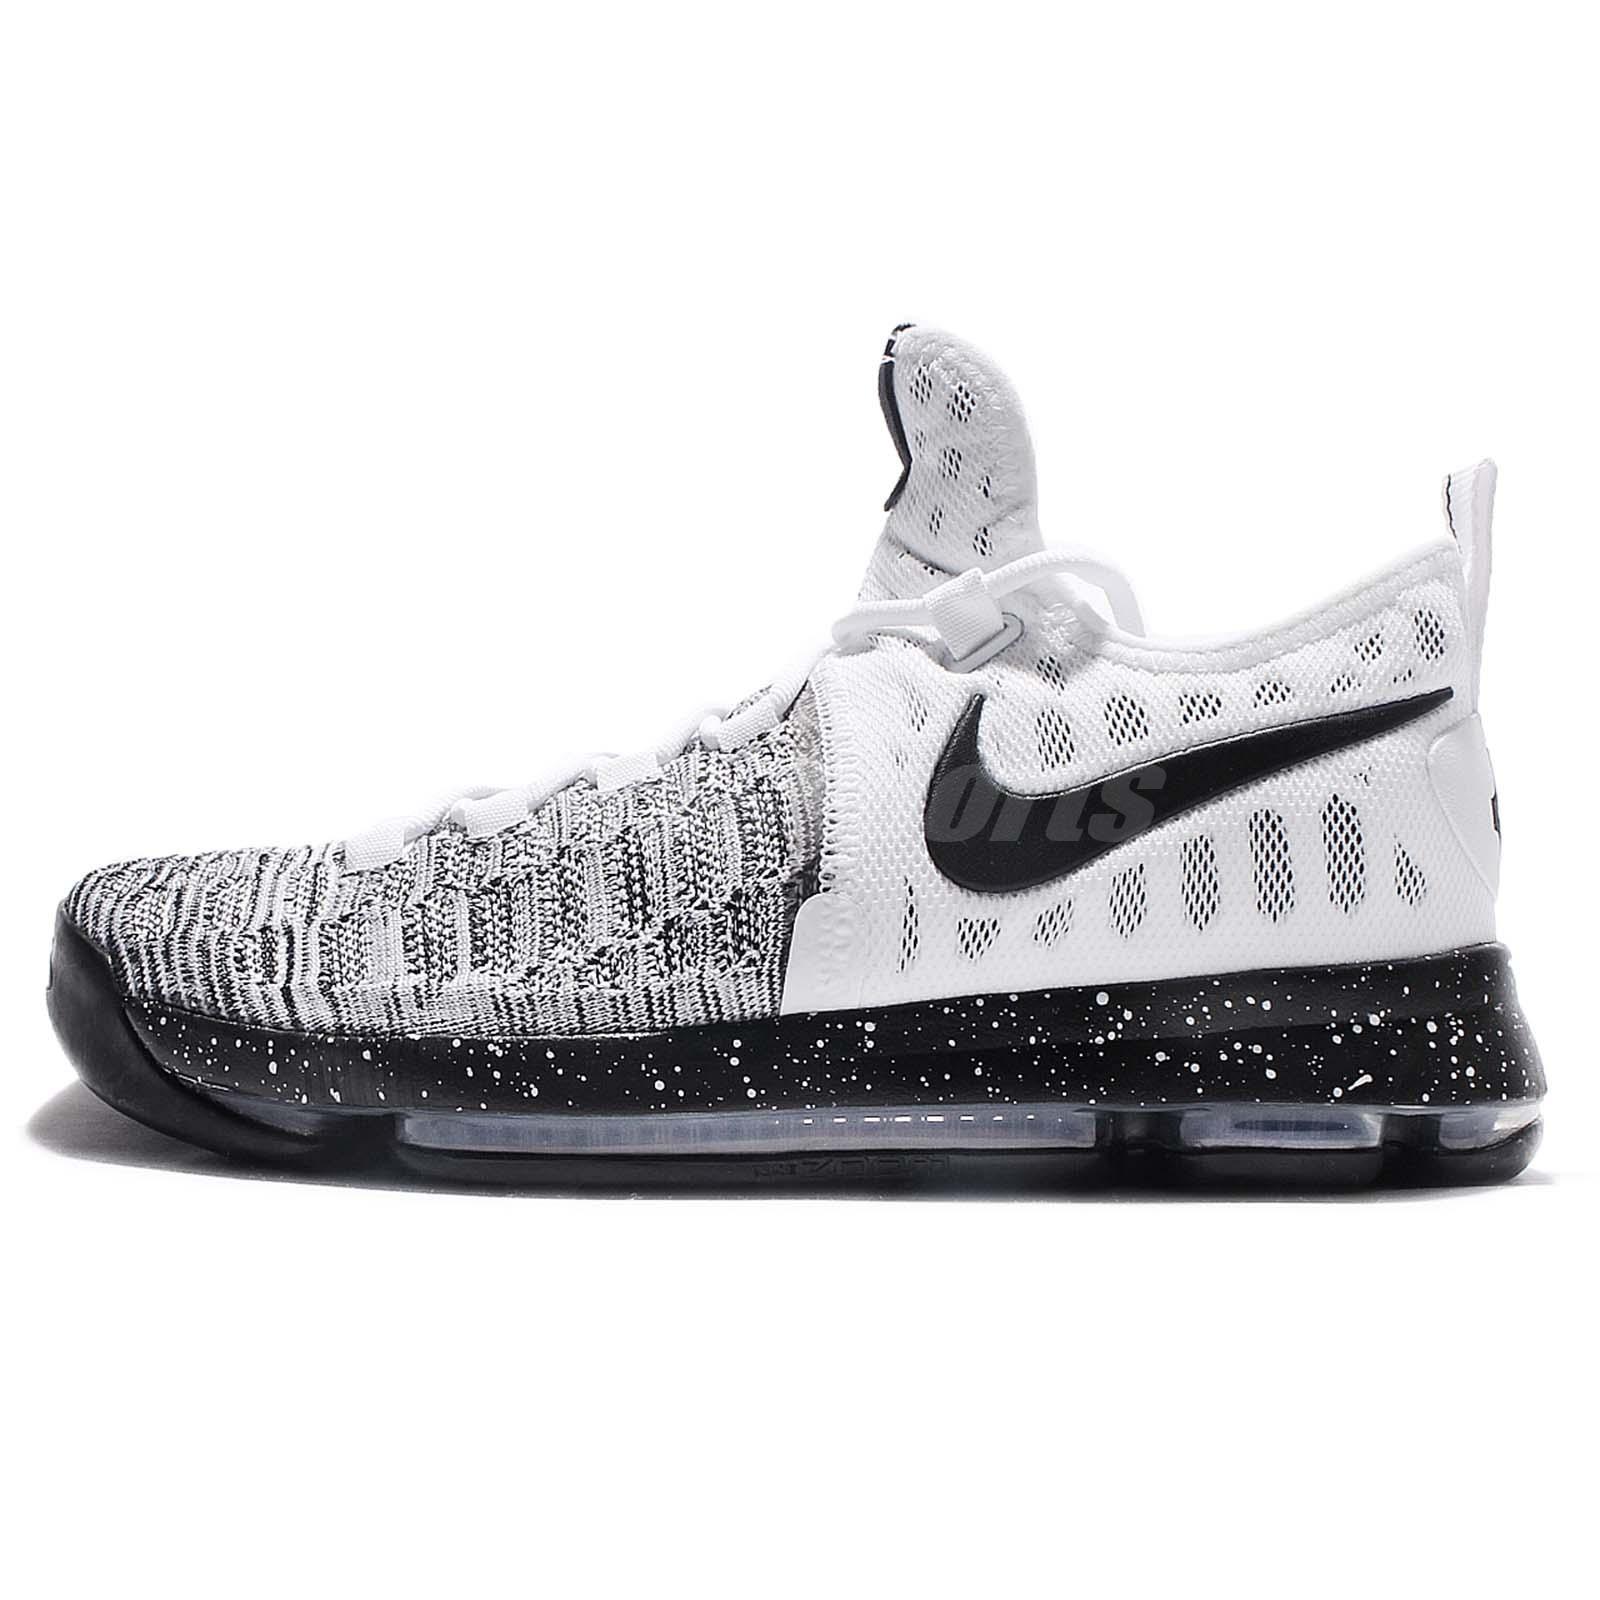 Nike Zoom KD 9 EP IX Kevin Durant White Black Men Basketball Shoes  844382-100